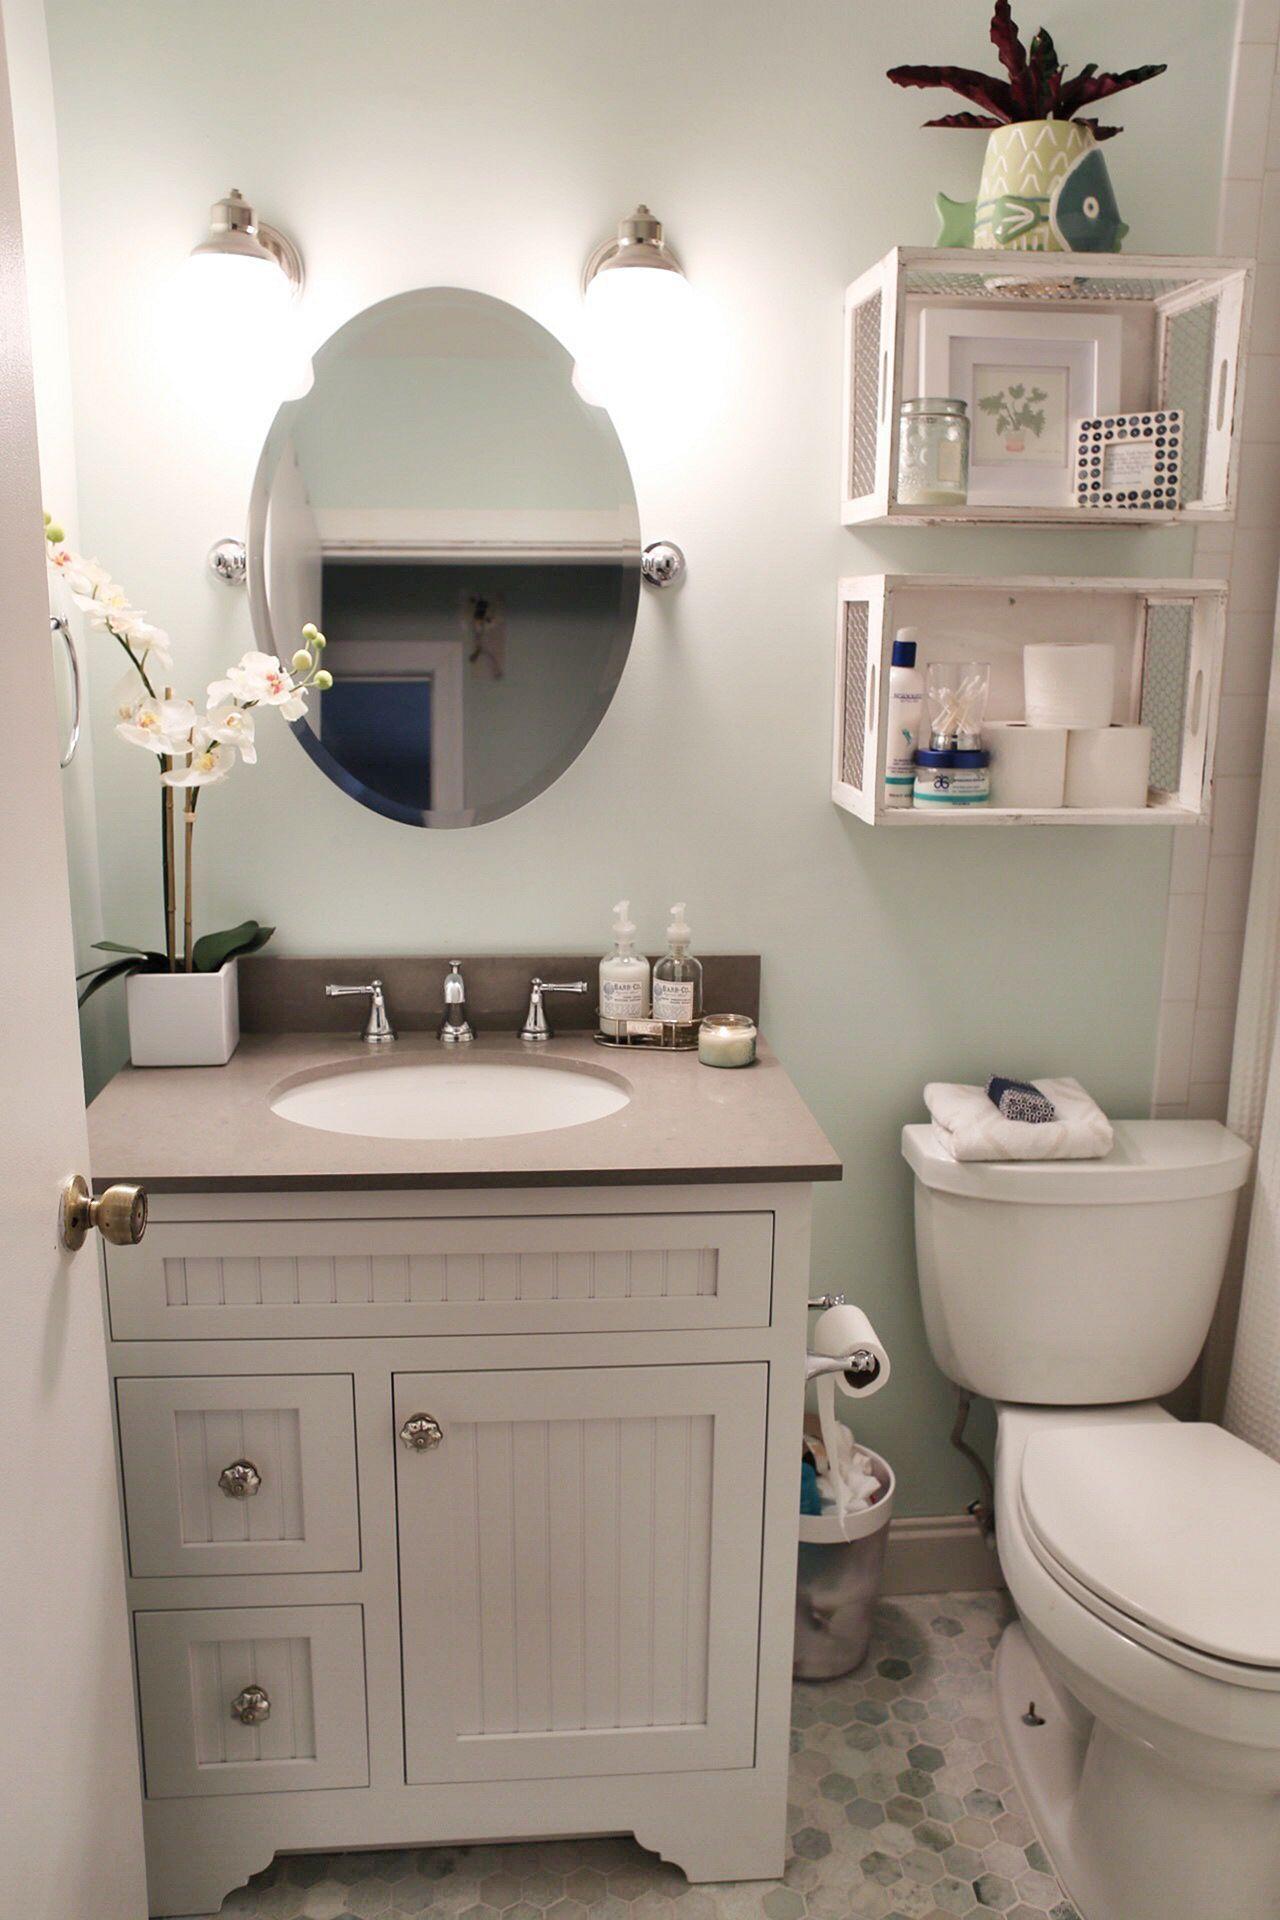 extraordinary beige bathroom designs | 115 Extraordinary Small Bathroom Designs For Small Space ...